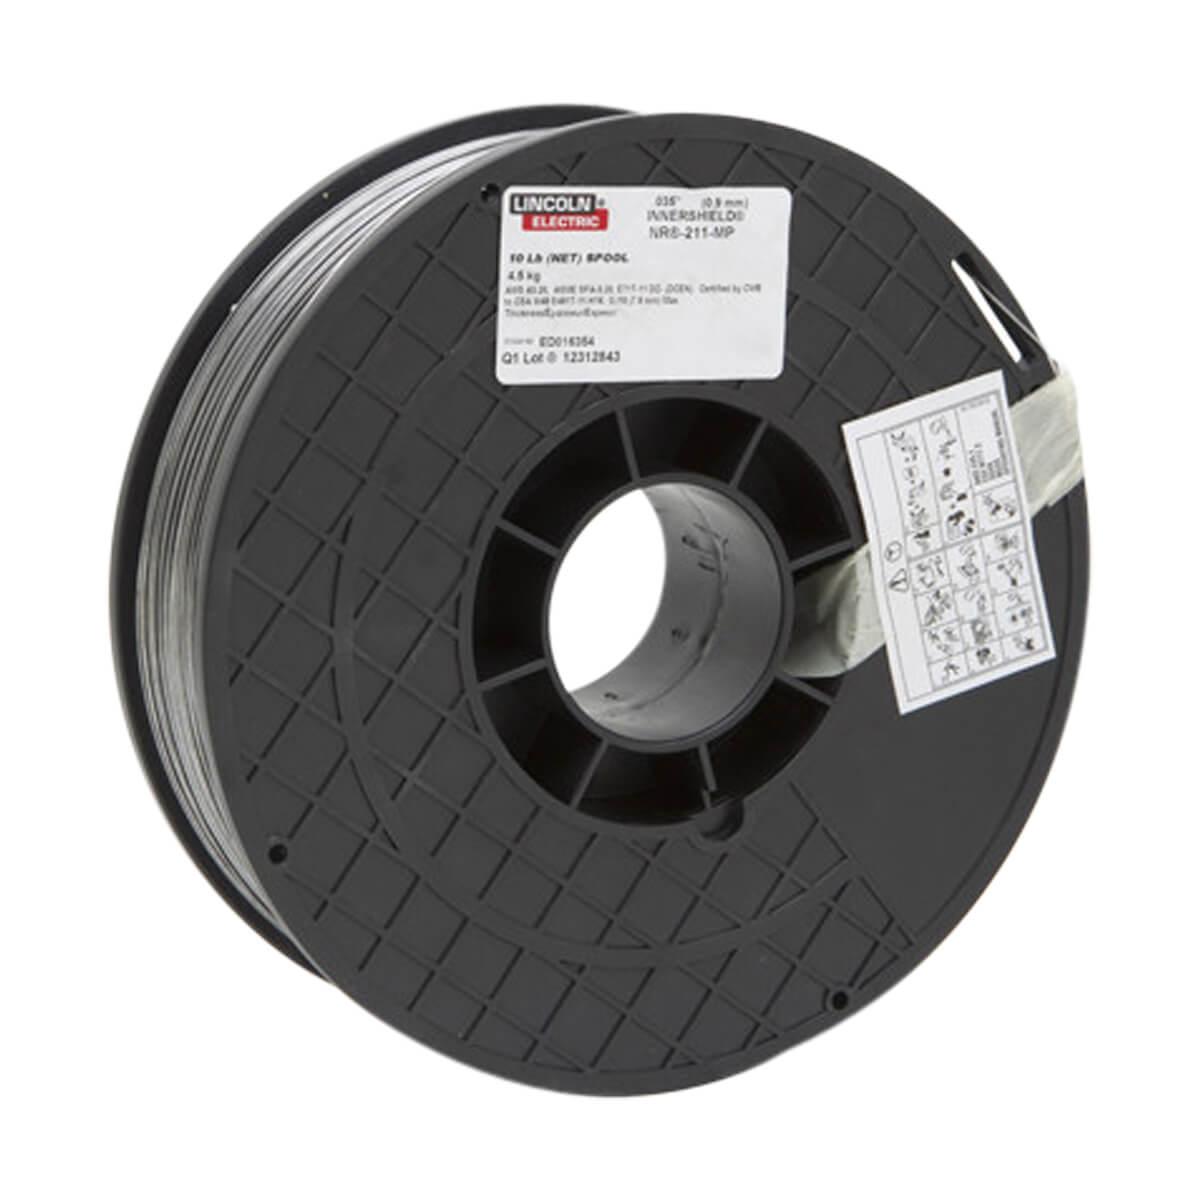 Lincoln Innershield Mig Wire - .035 11 lb NR211MP